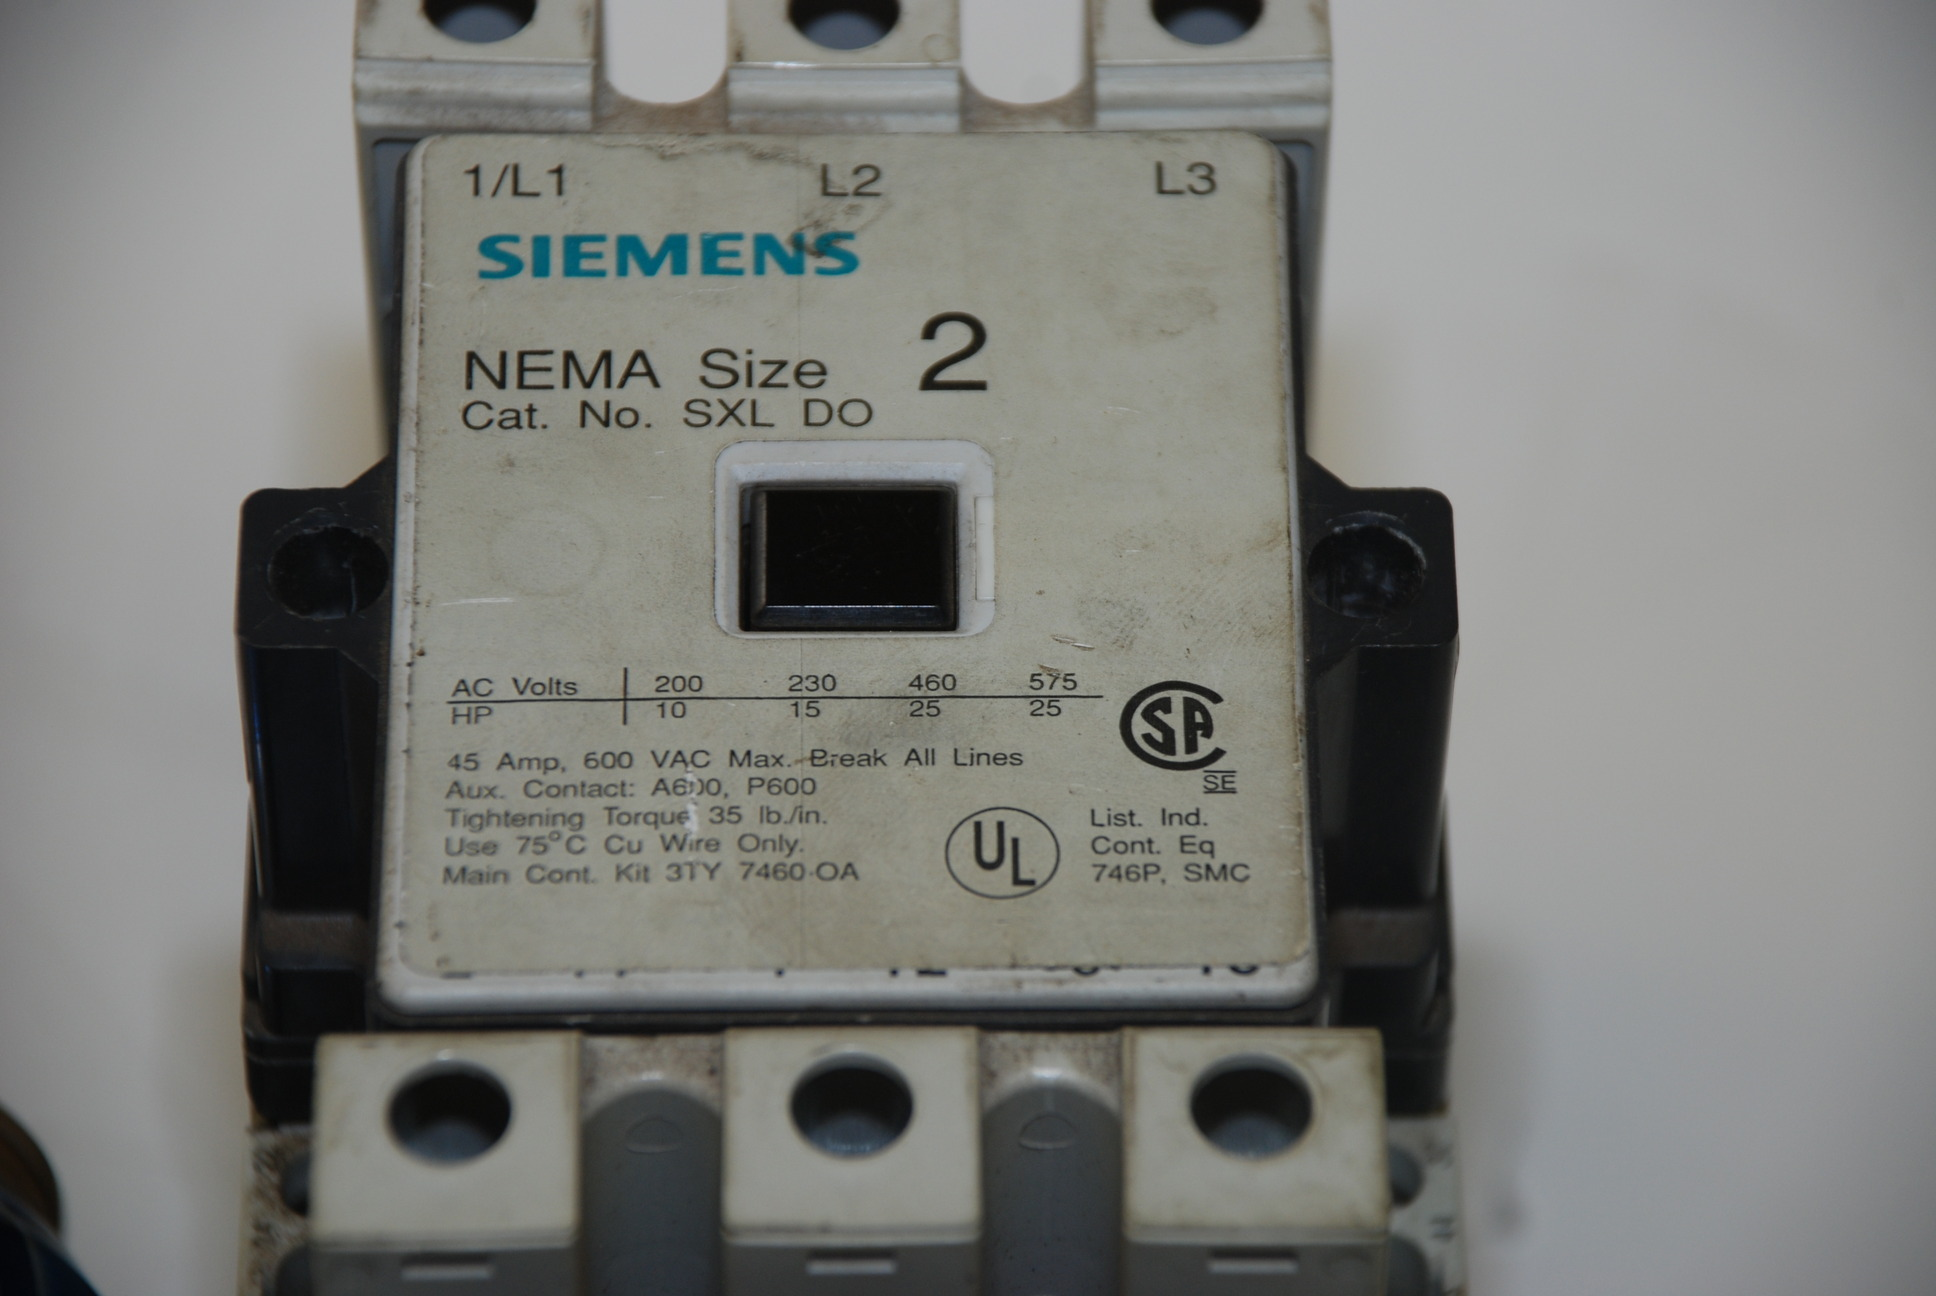 Siemens Sxl Do Size 2 Electric Motor Starter Of